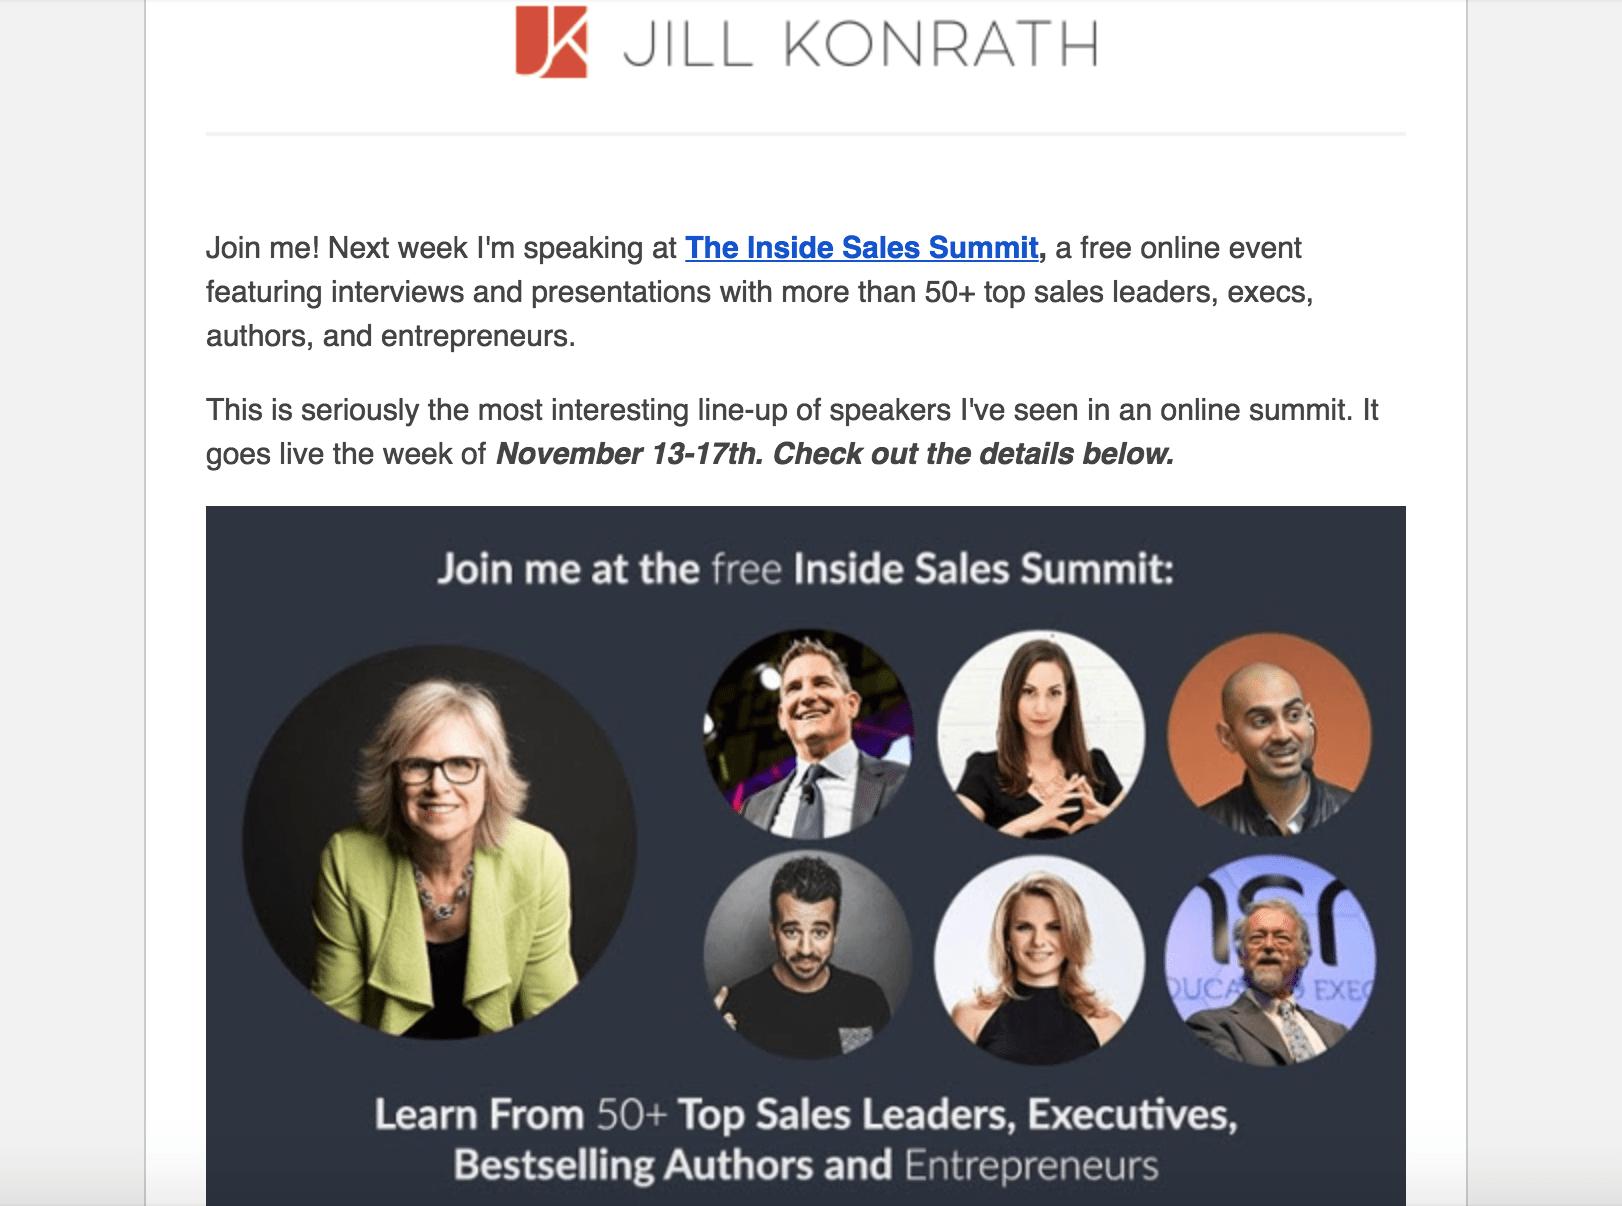 launch virtual summit jill konrath email.png